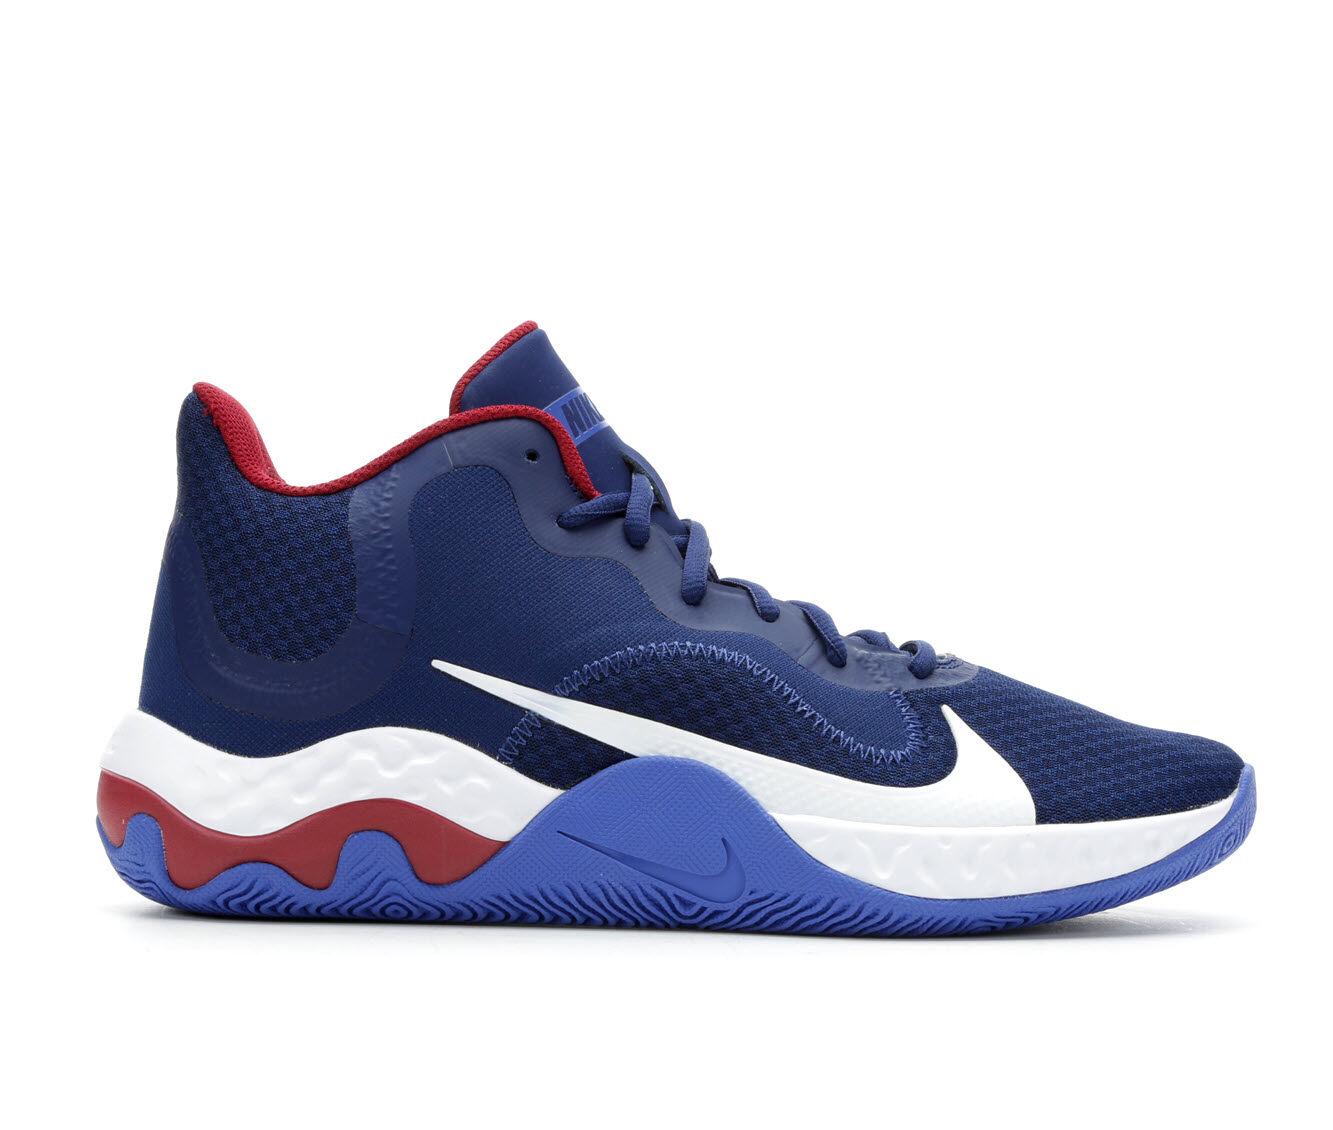 Men's Nike Renew Elevate Basketball Shoes